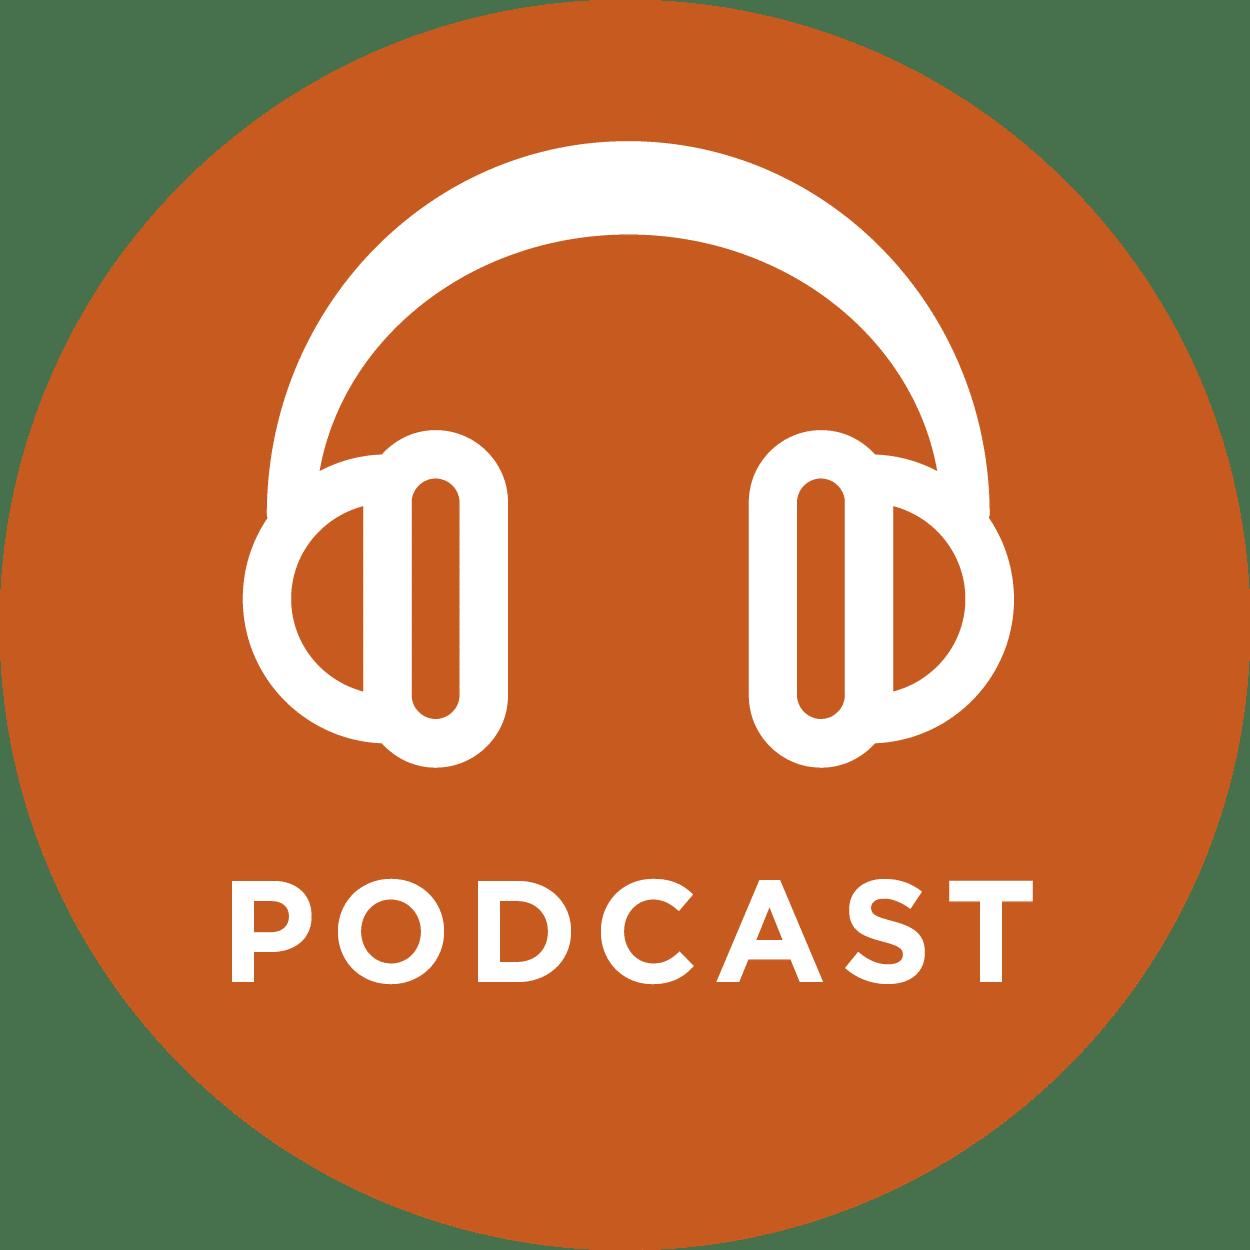 Podcast adavasymt